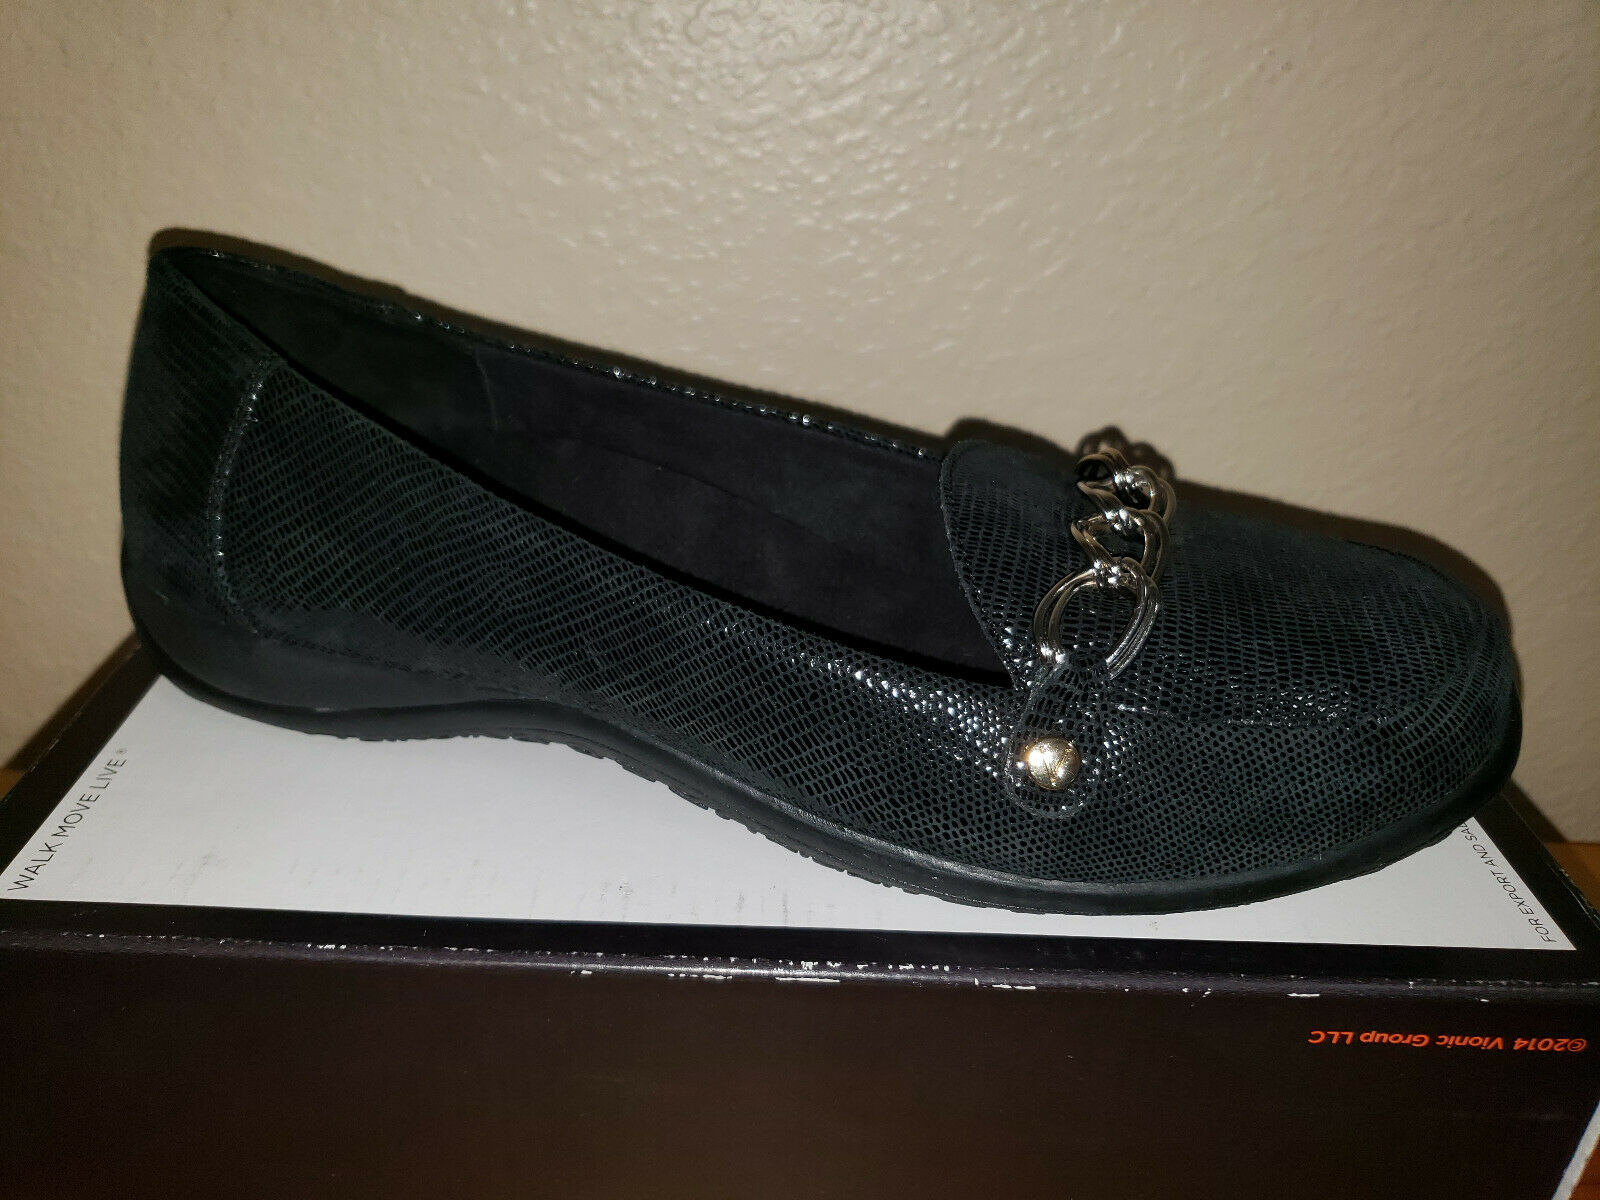 130 NEW Womens 9.5 Wide Vionic Charm Alda Loafers Black Lizard